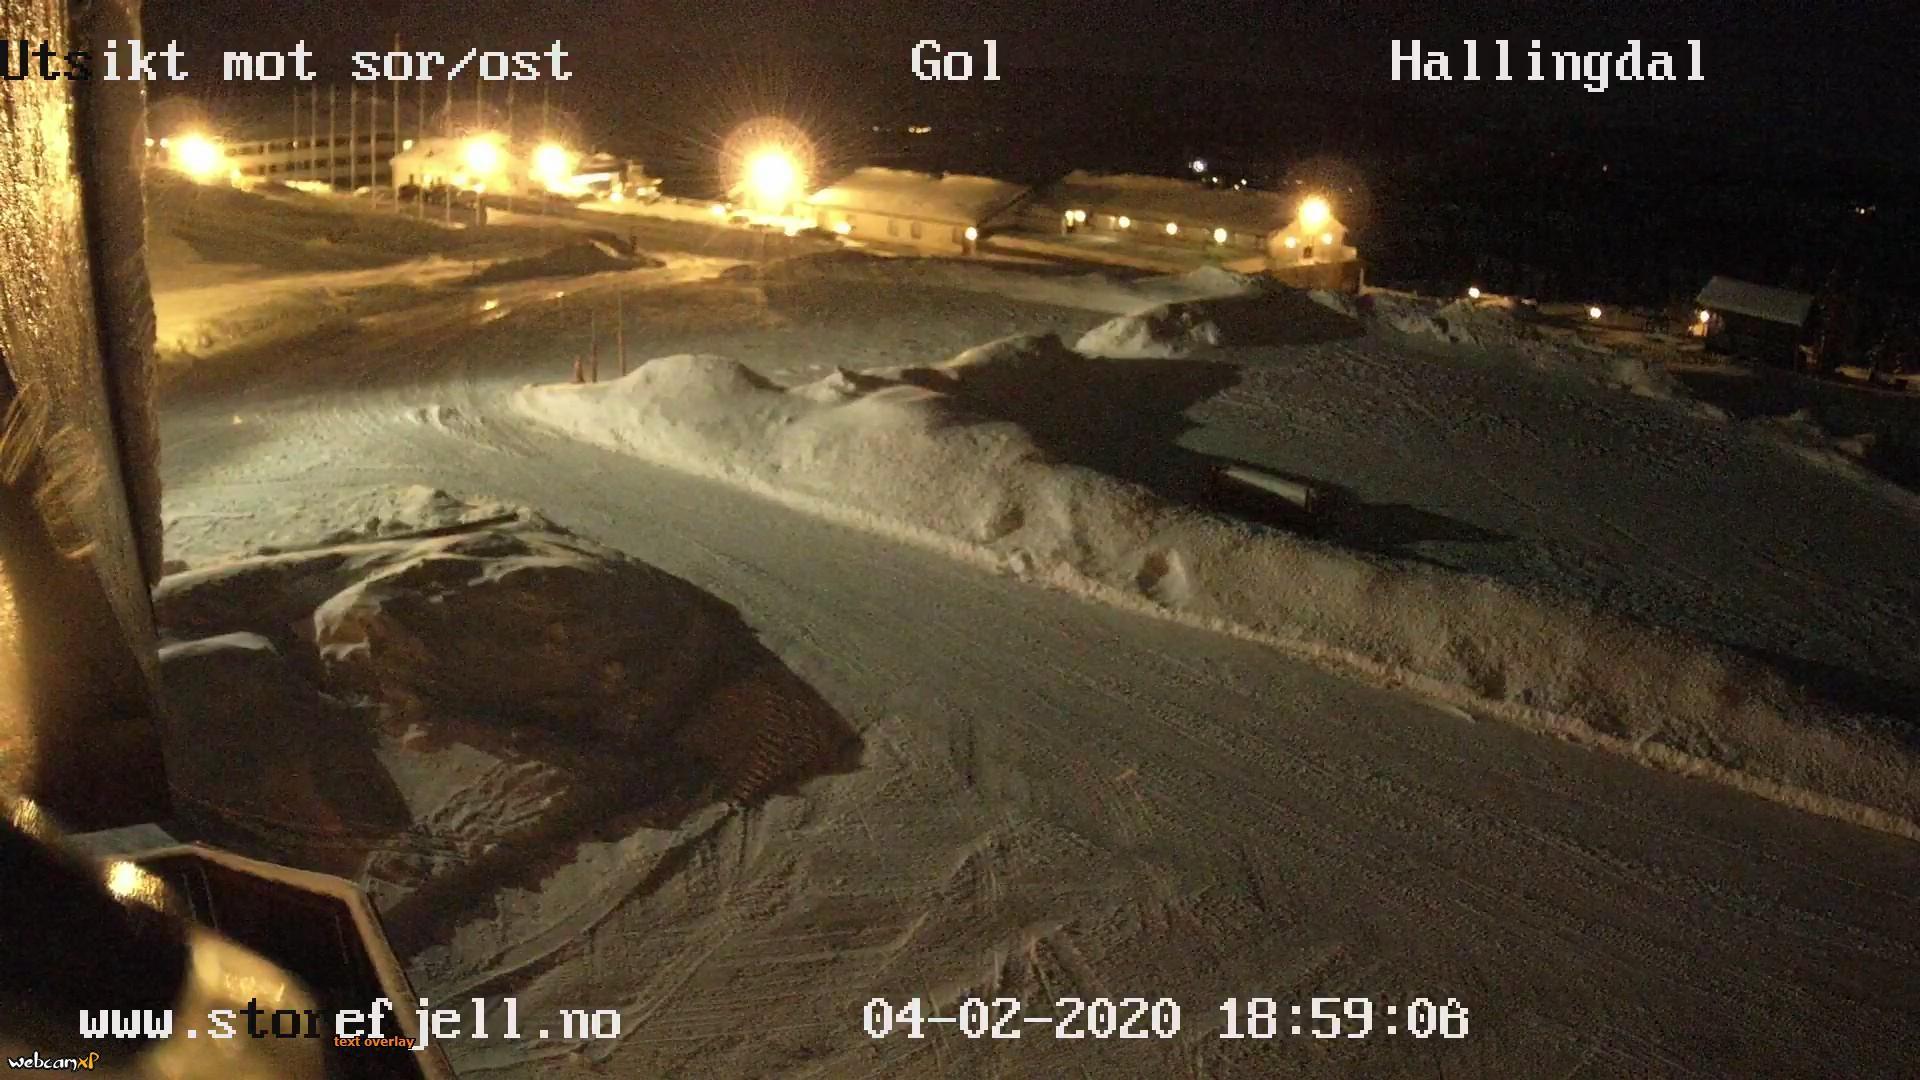 Webkamera Kamben: Storefjell Resort hotel Golsfjellet